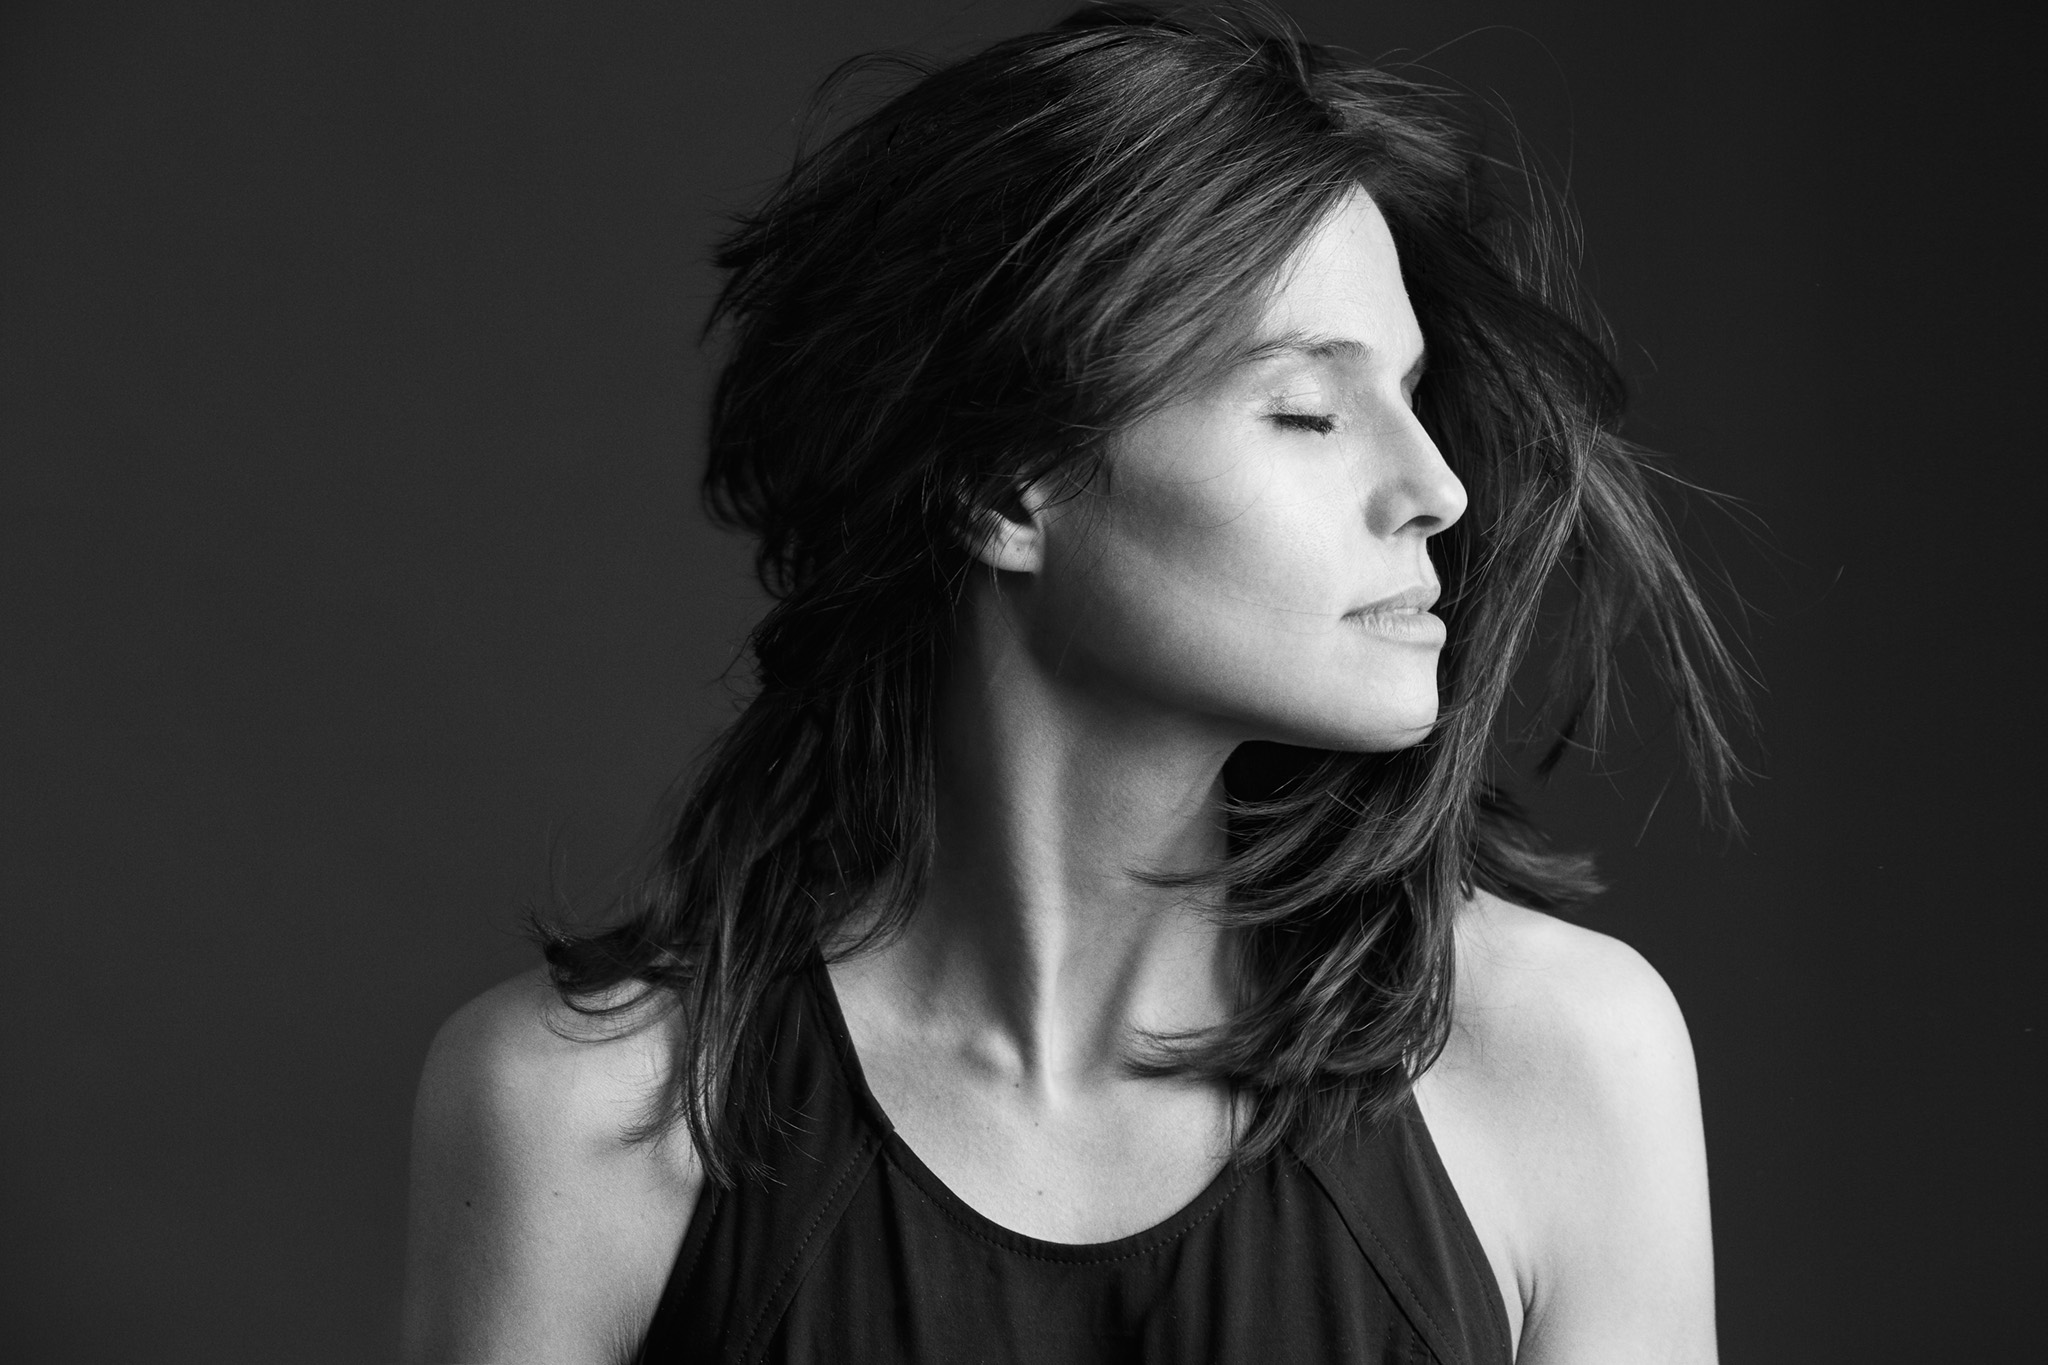 Nicole_Peelman_Portrait_Commercial_Model_Fashion_Shoot_Minneapolis_Photographer_Joe_Lemke_002.JPG